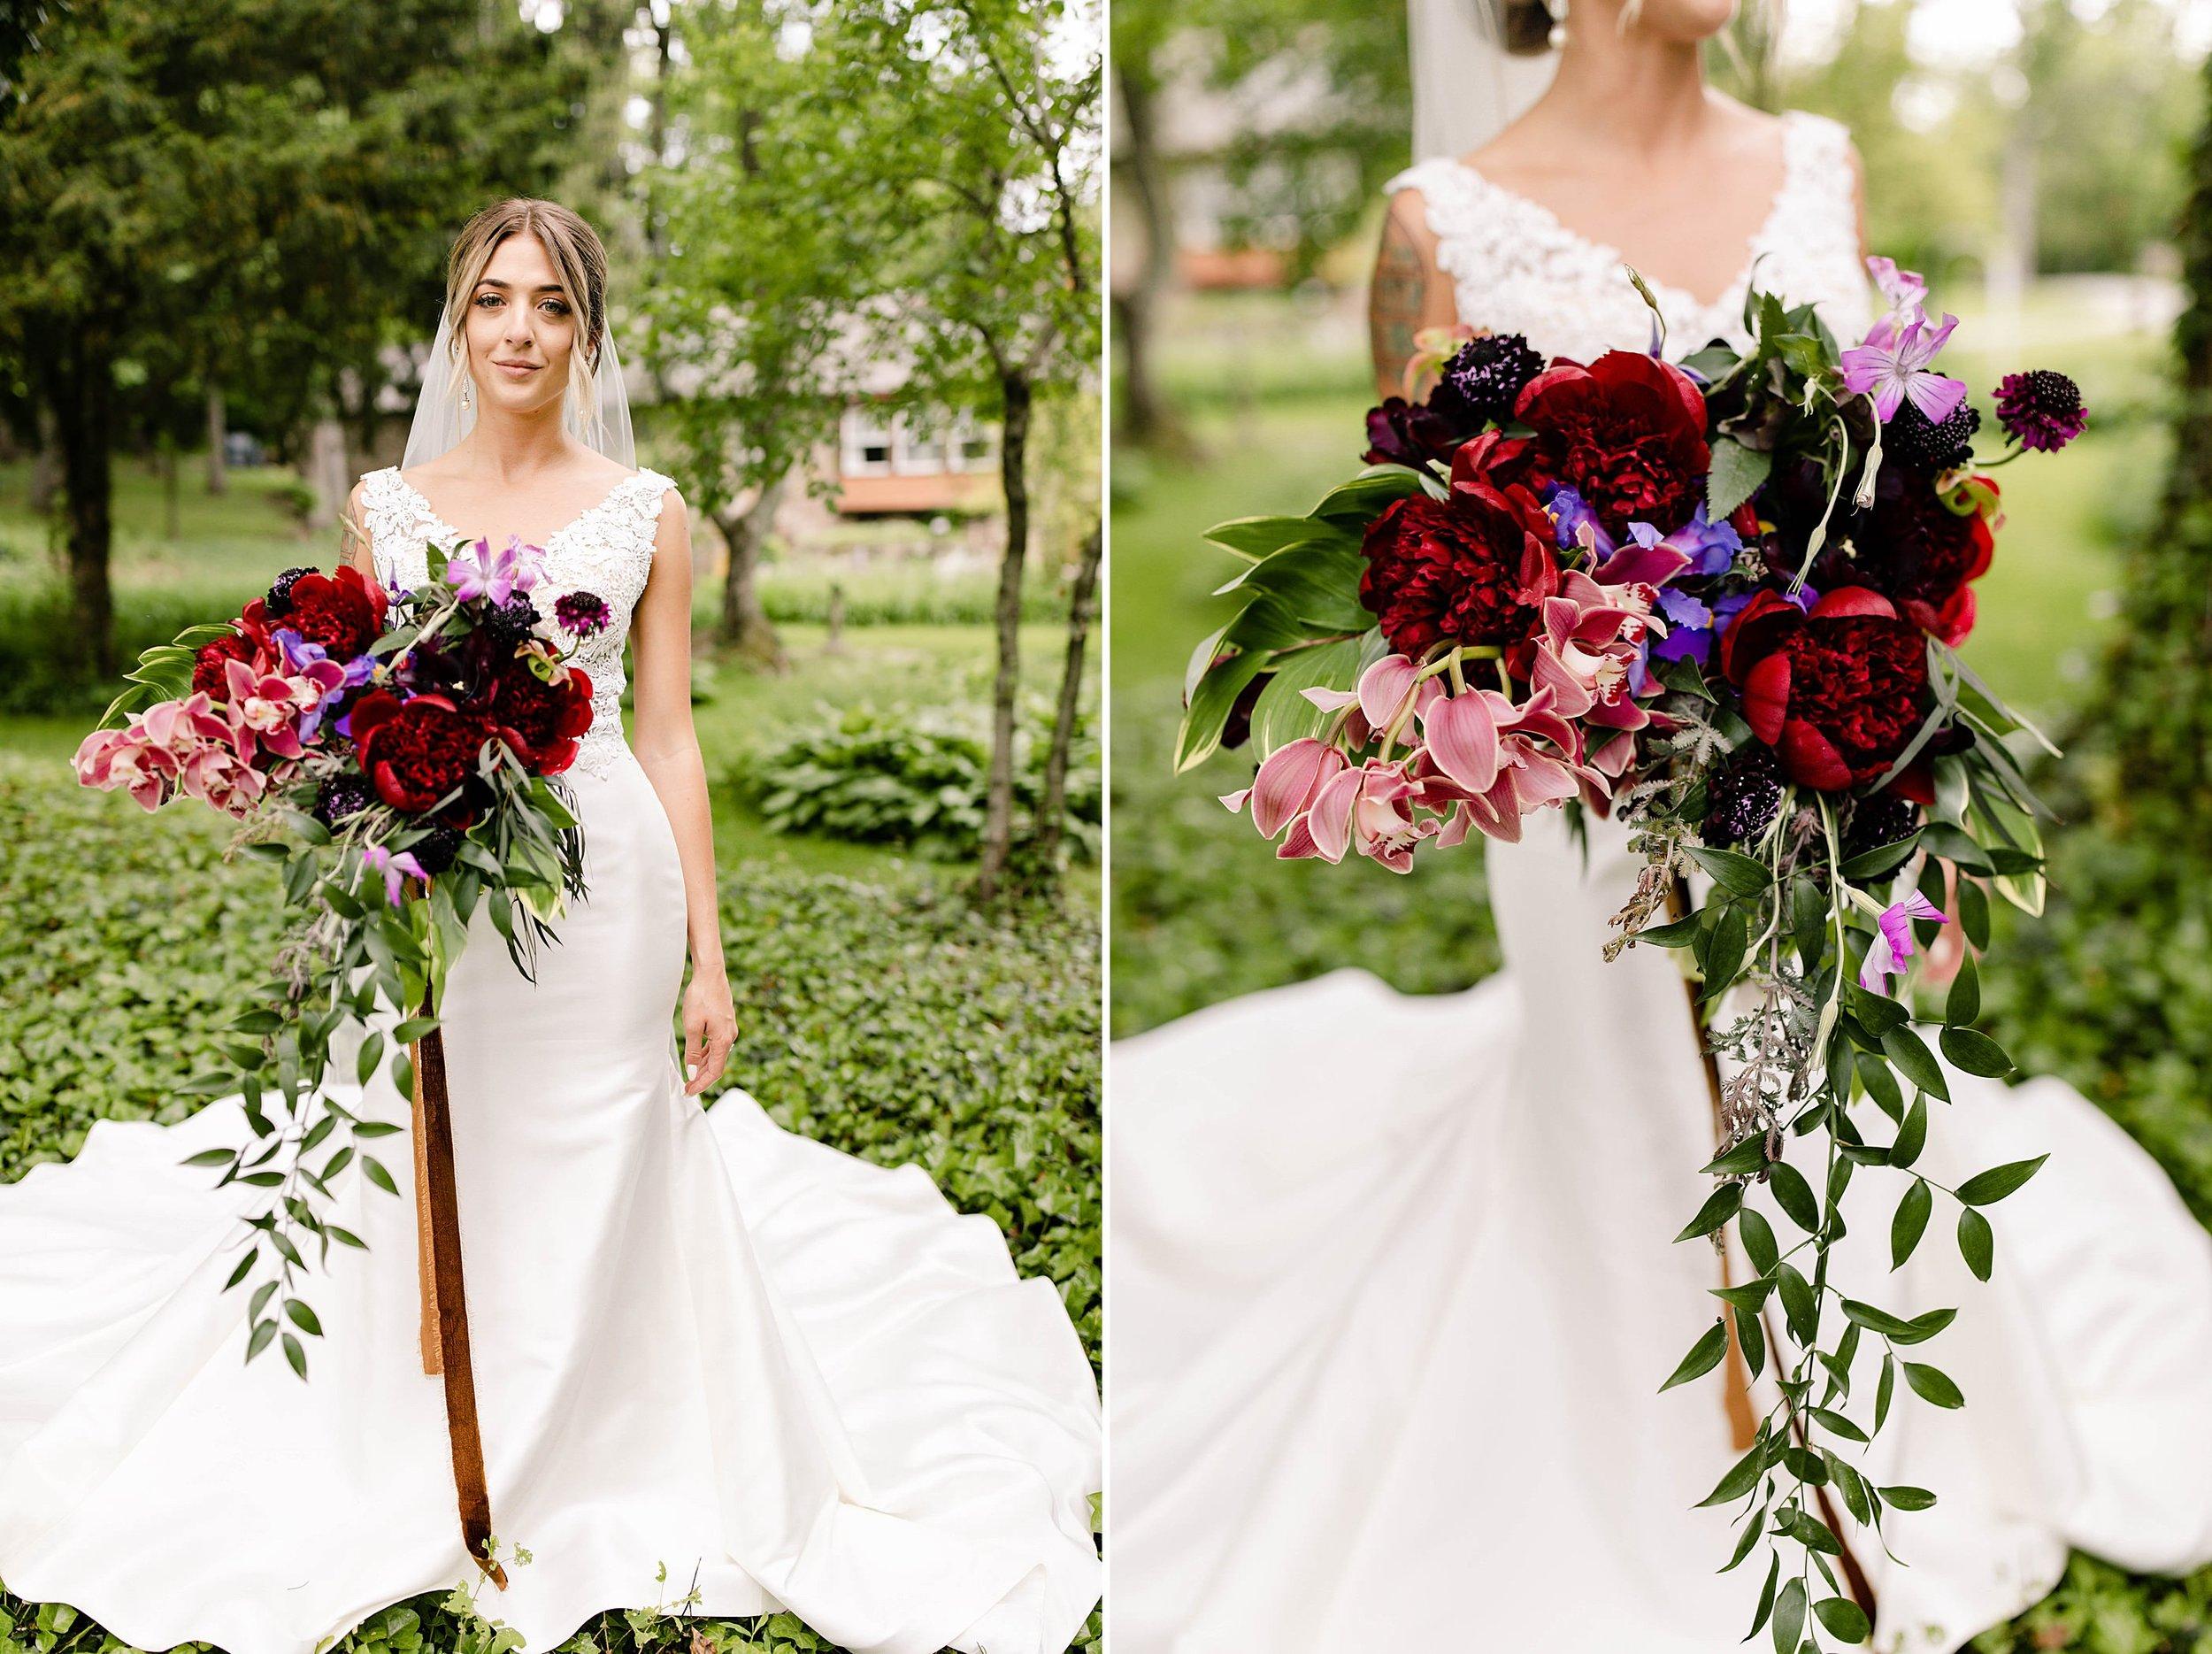 romanticspringwedding-866.jpg